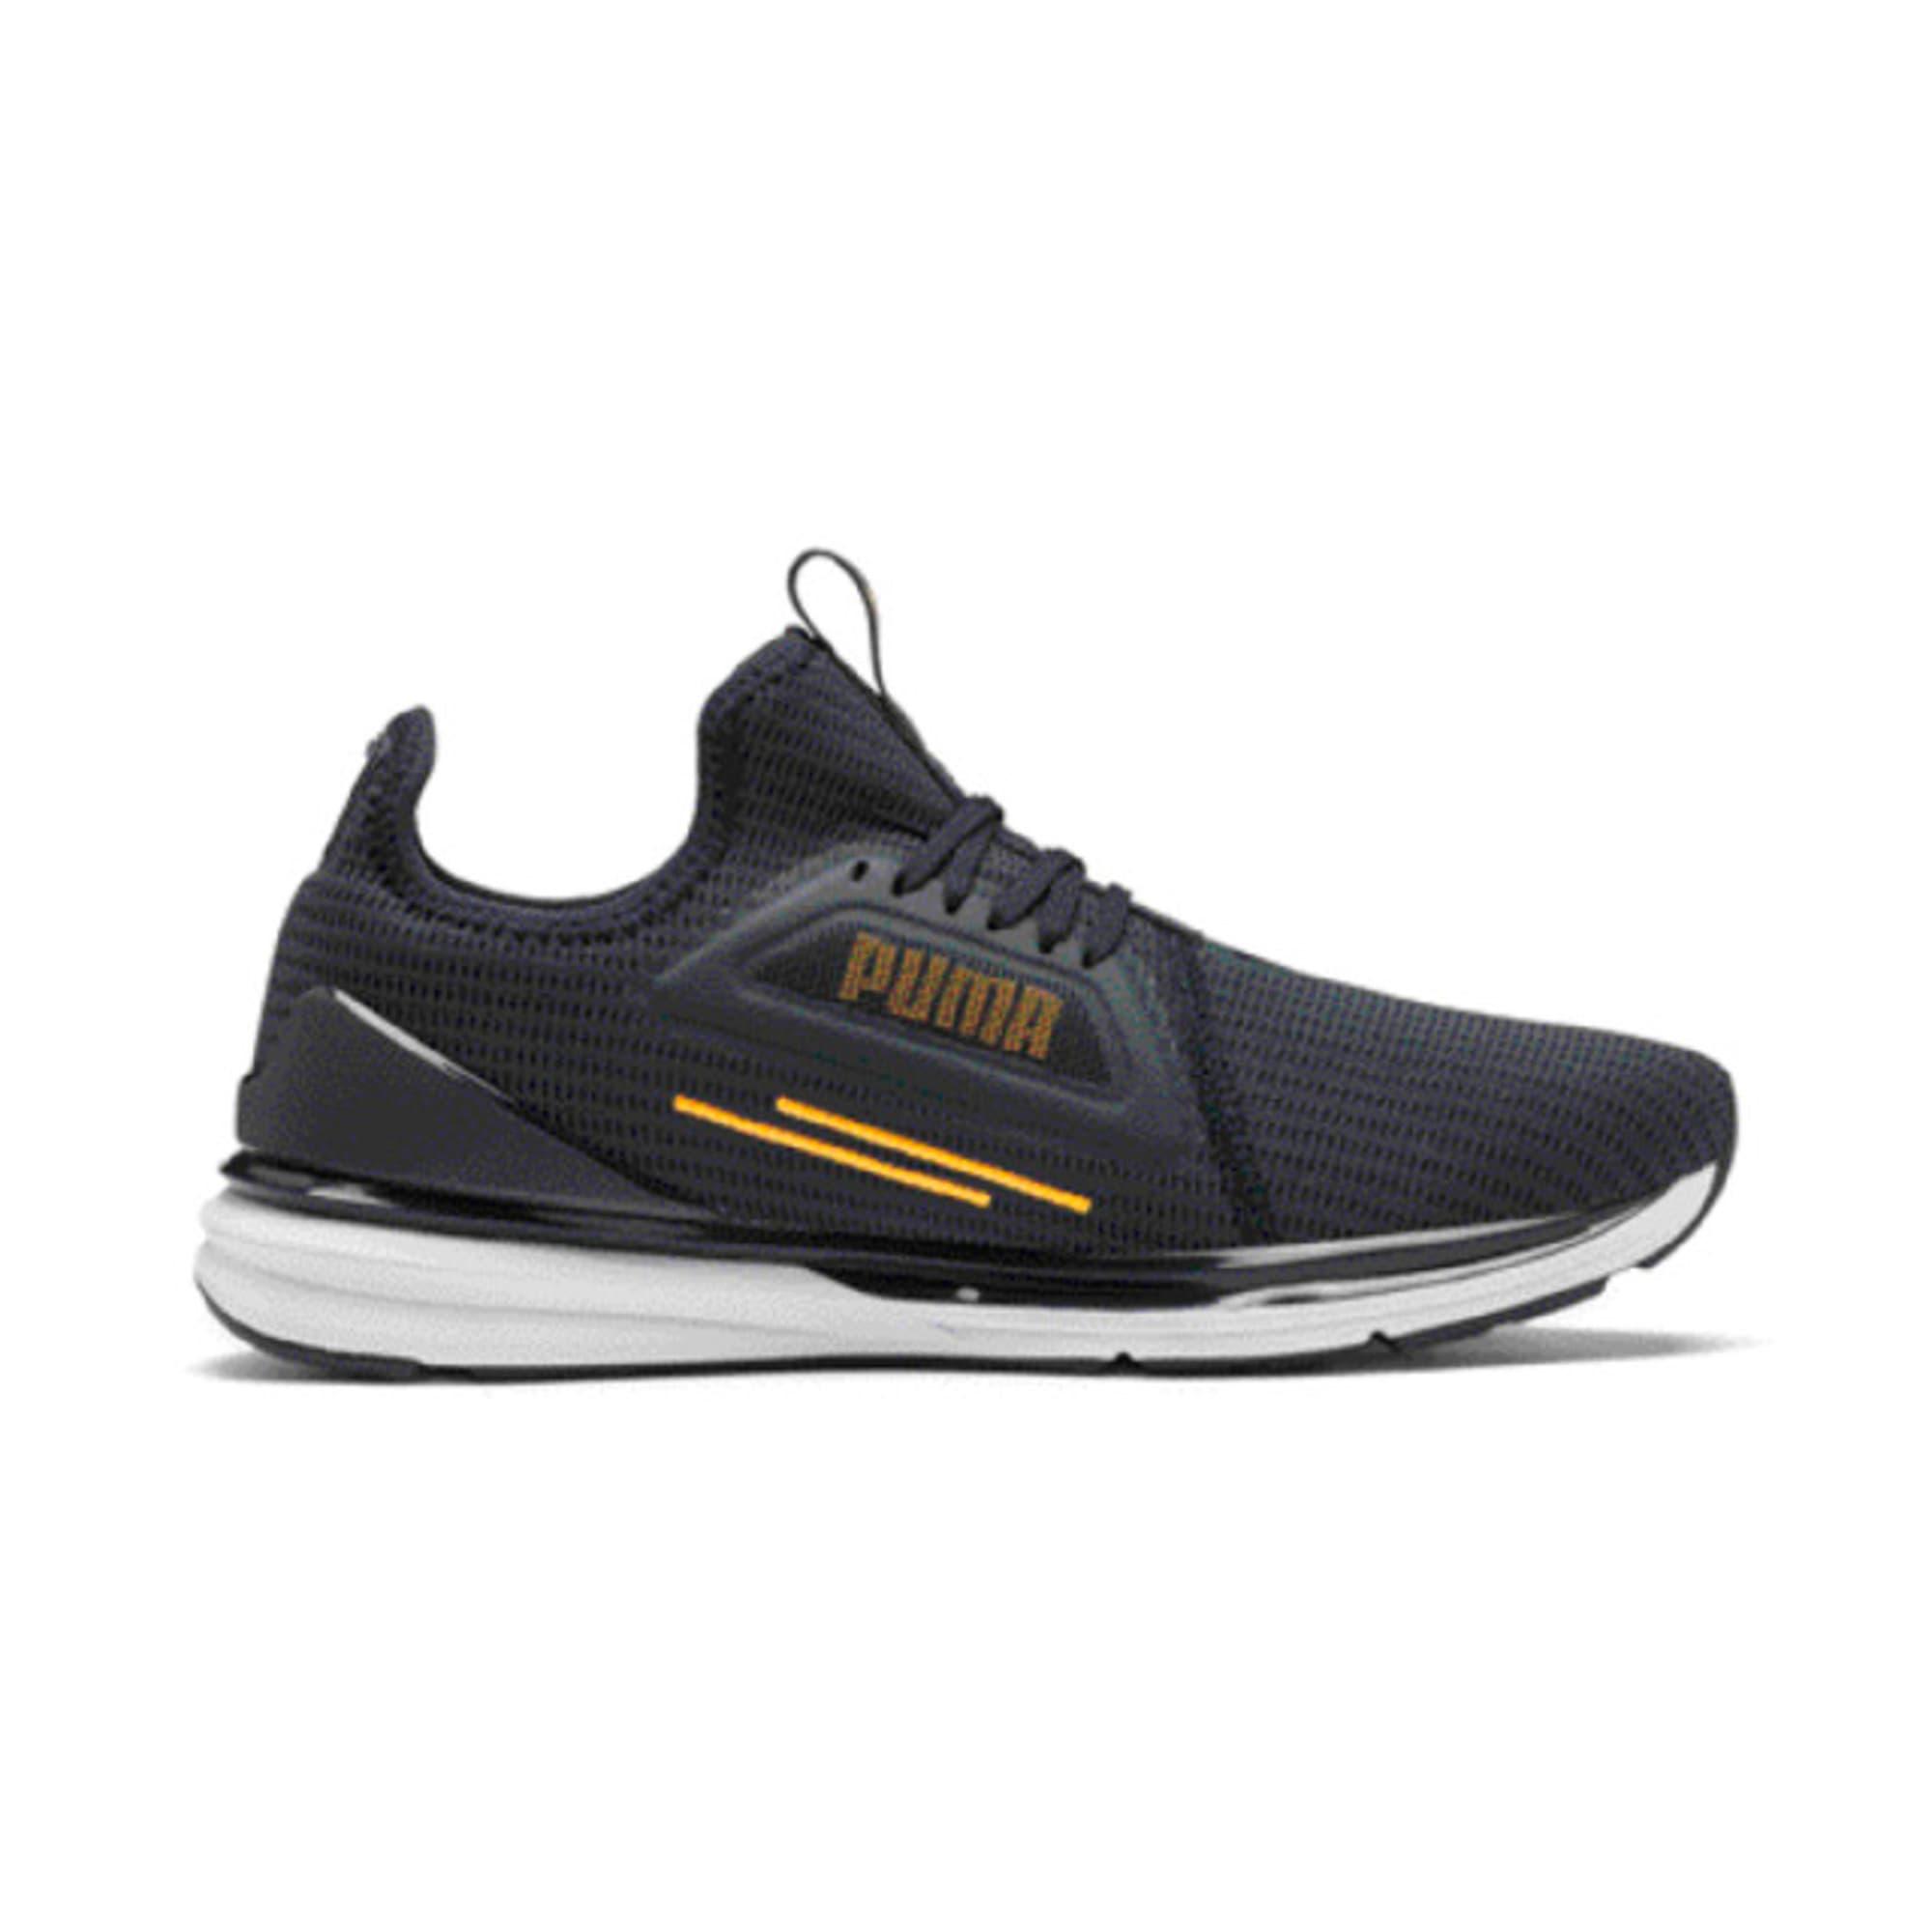 Thumbnail 5 of IGNITE Limitless Lean Running Shoes, Peacoat-Orange Alert, medium-IND